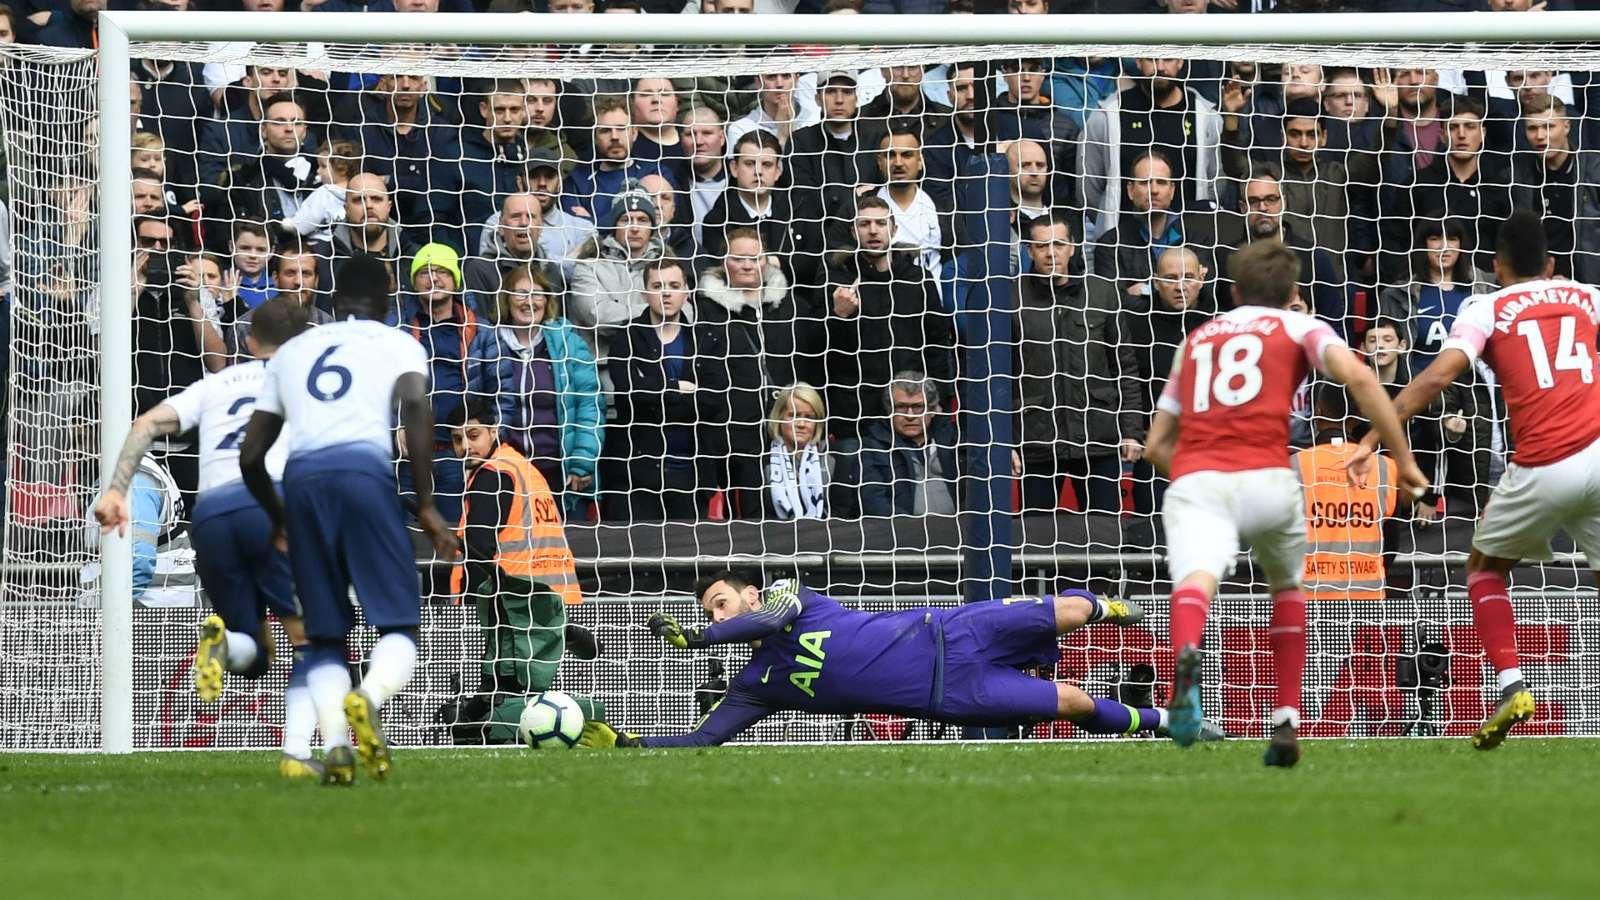 hugo lloris cropped df8h3ckjxql31iecpo2jtdtee - Tottenham vs Arsenal 1-1: PREMIER LEAGUE Match Report & Highlights [Watch Video]